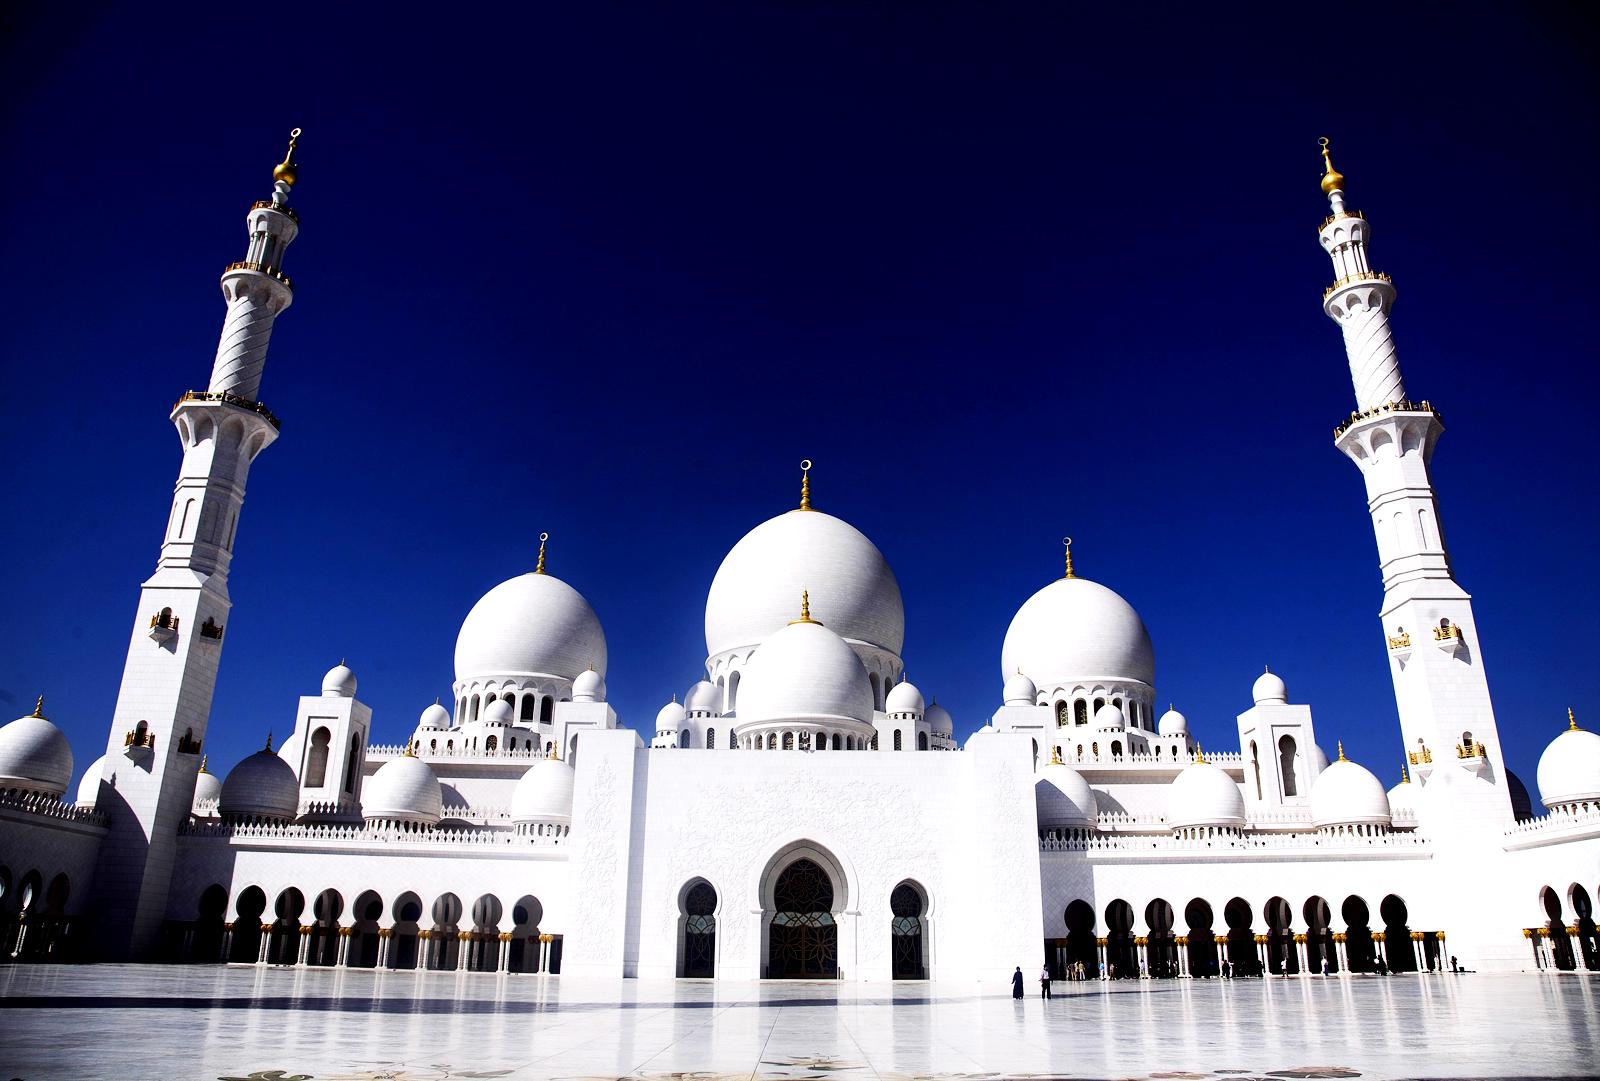 Beautiful Islamic Buildings Wallpapers: [47+] HD Mosque Wallpaper On WallpaperSafari